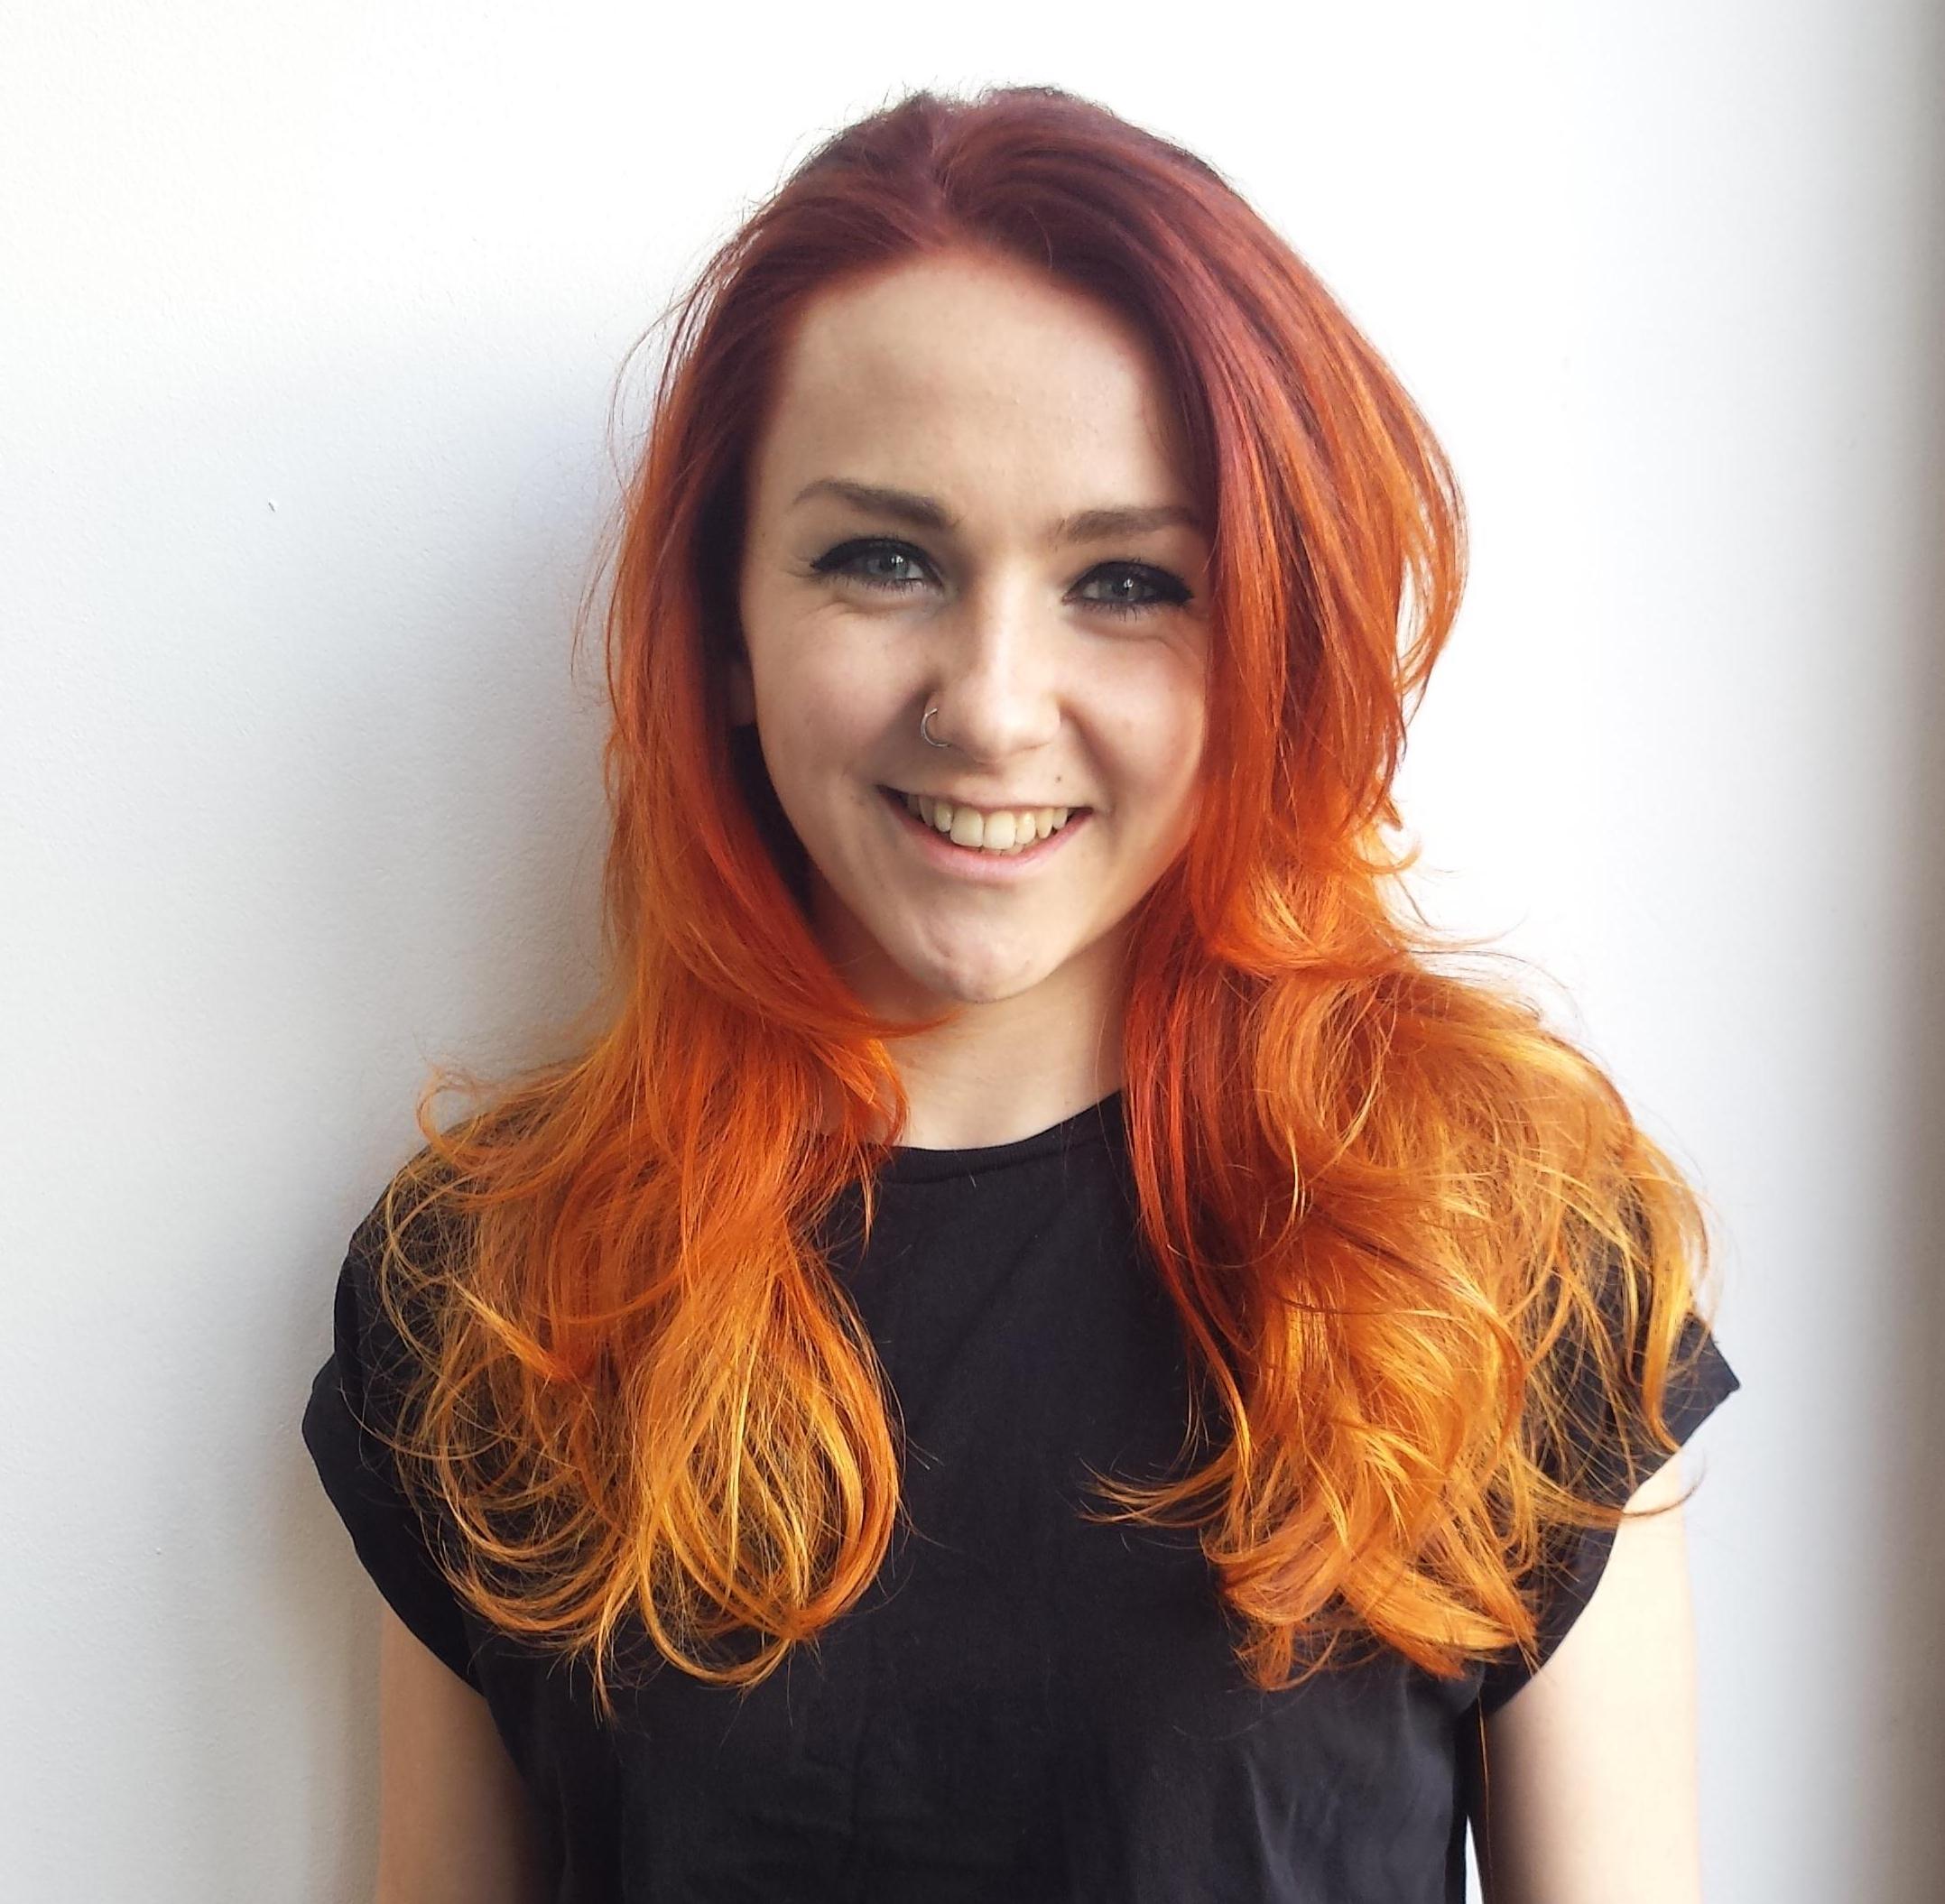 Copper Short Hair Hair Ideas Hair Color Pinterest Of